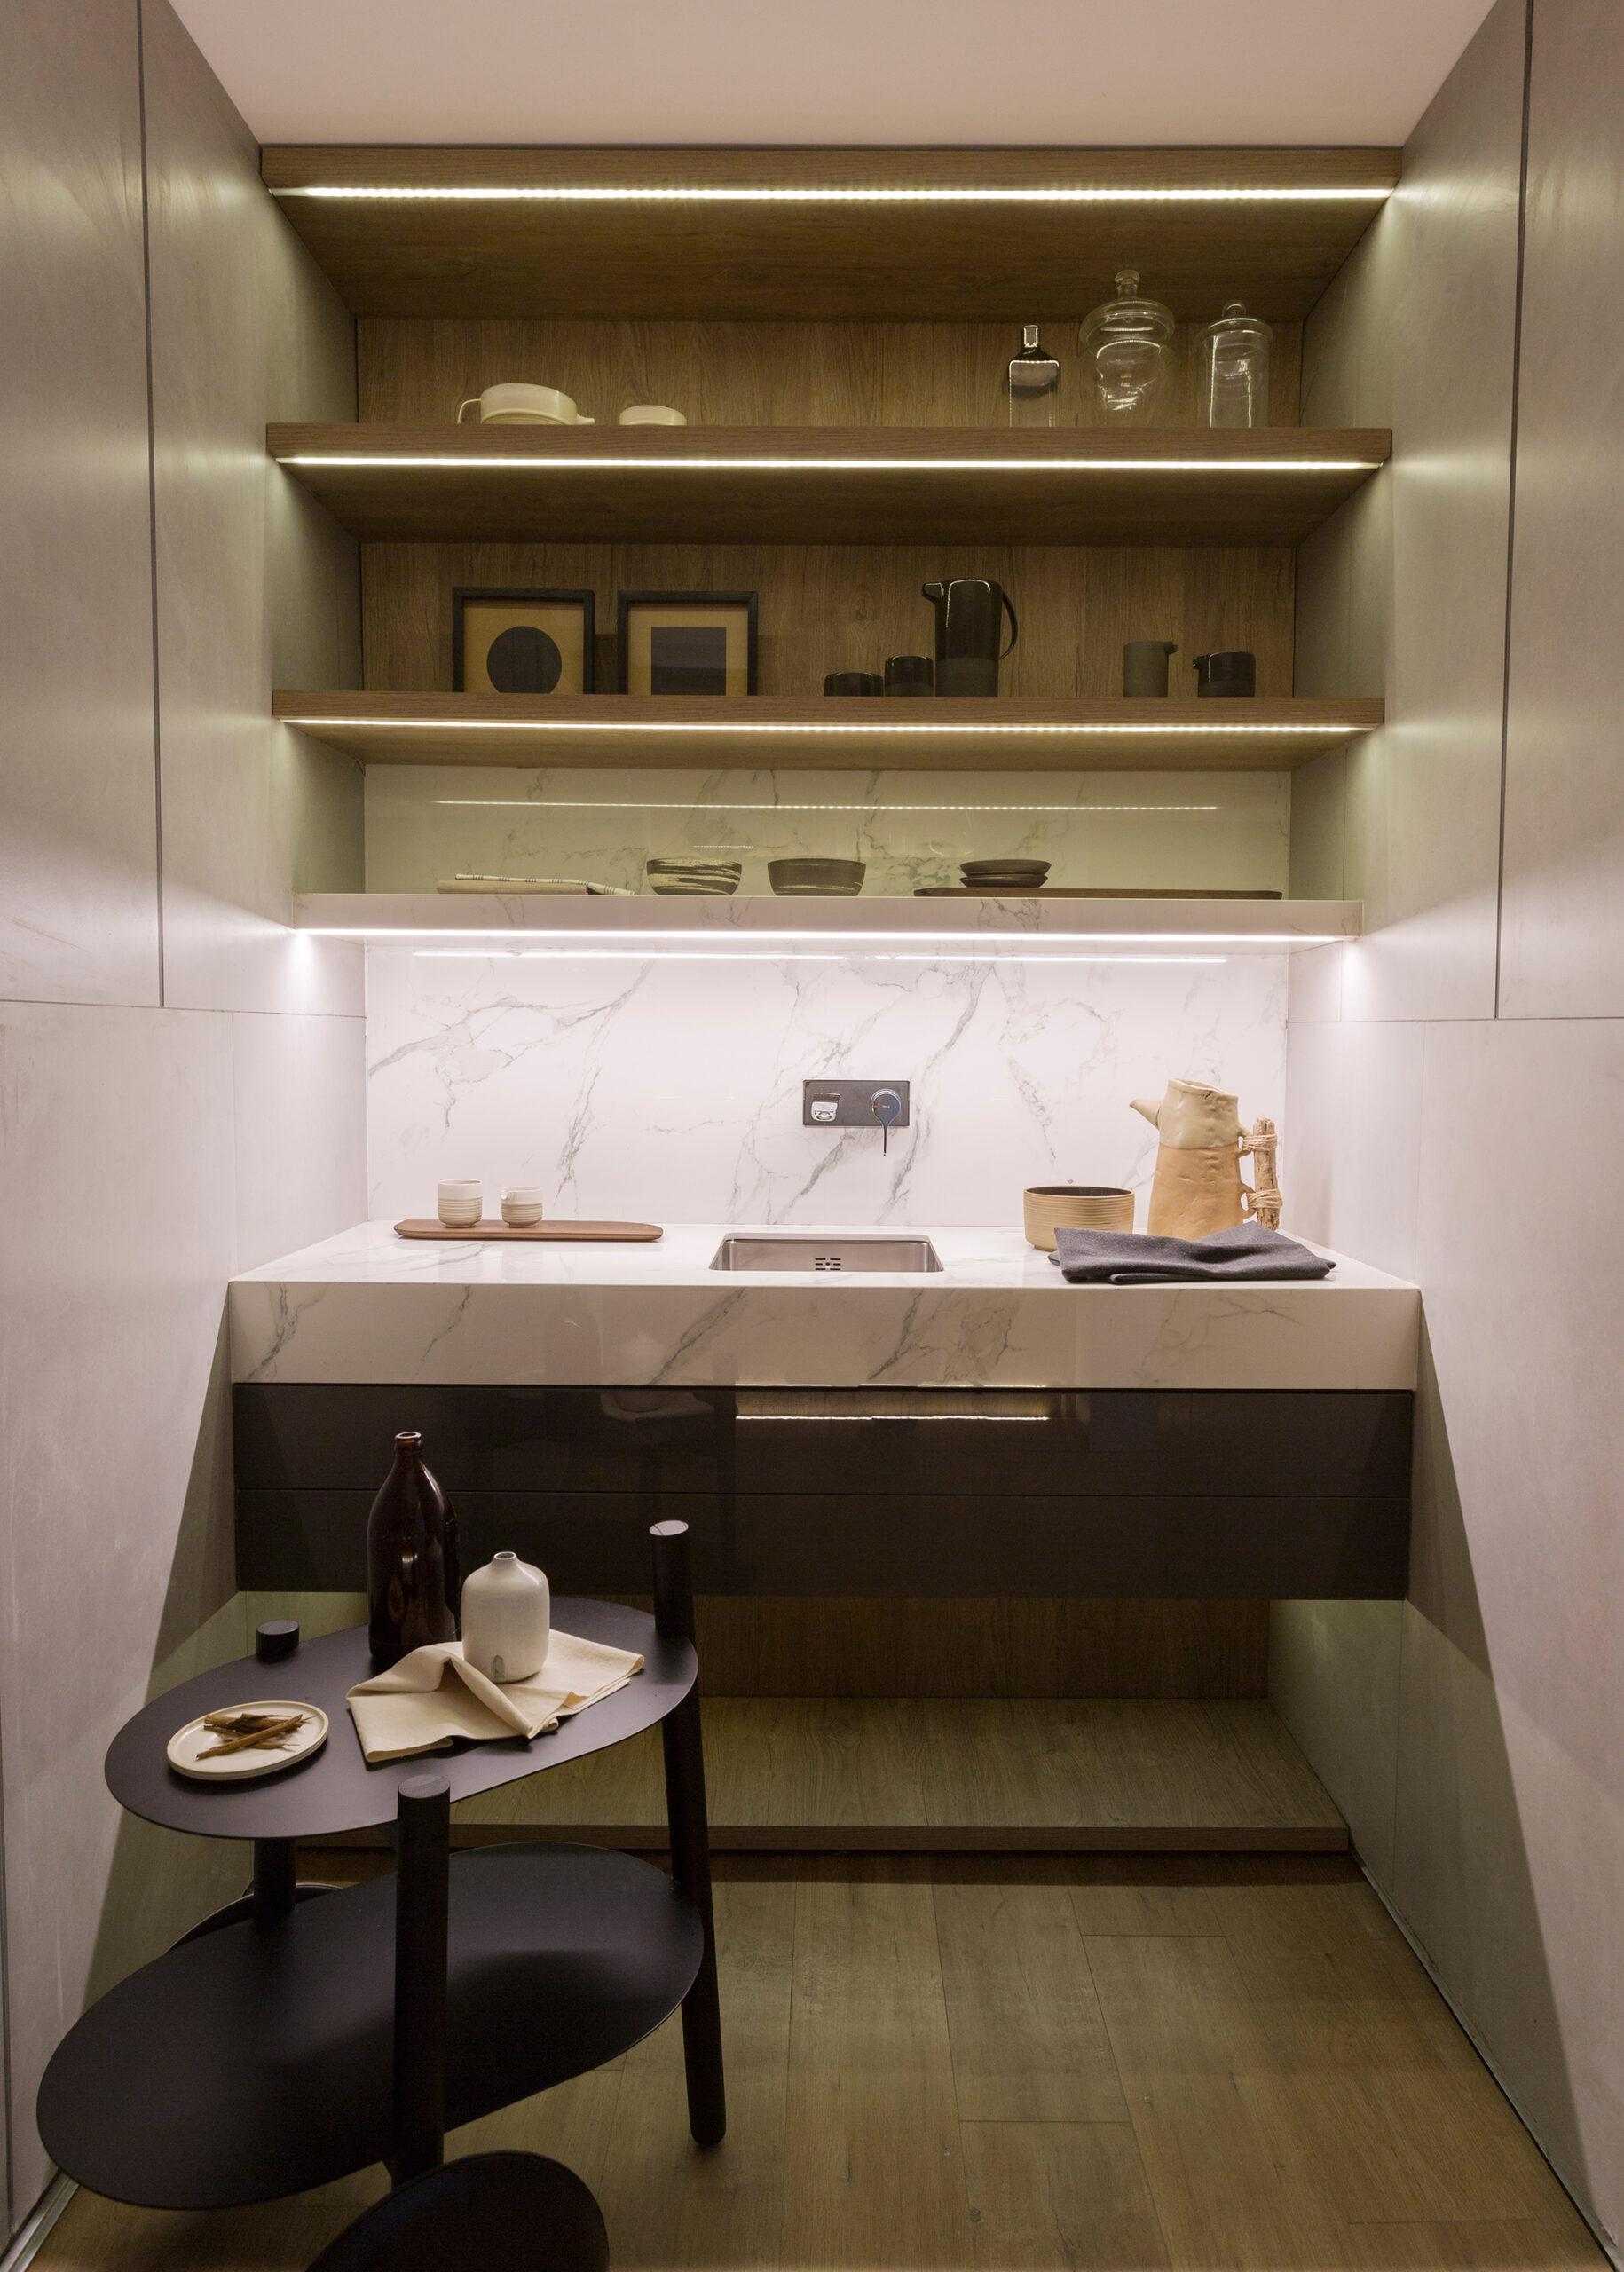 Romina Calzi Arquitectura interiorismo Casa foa 1@2x